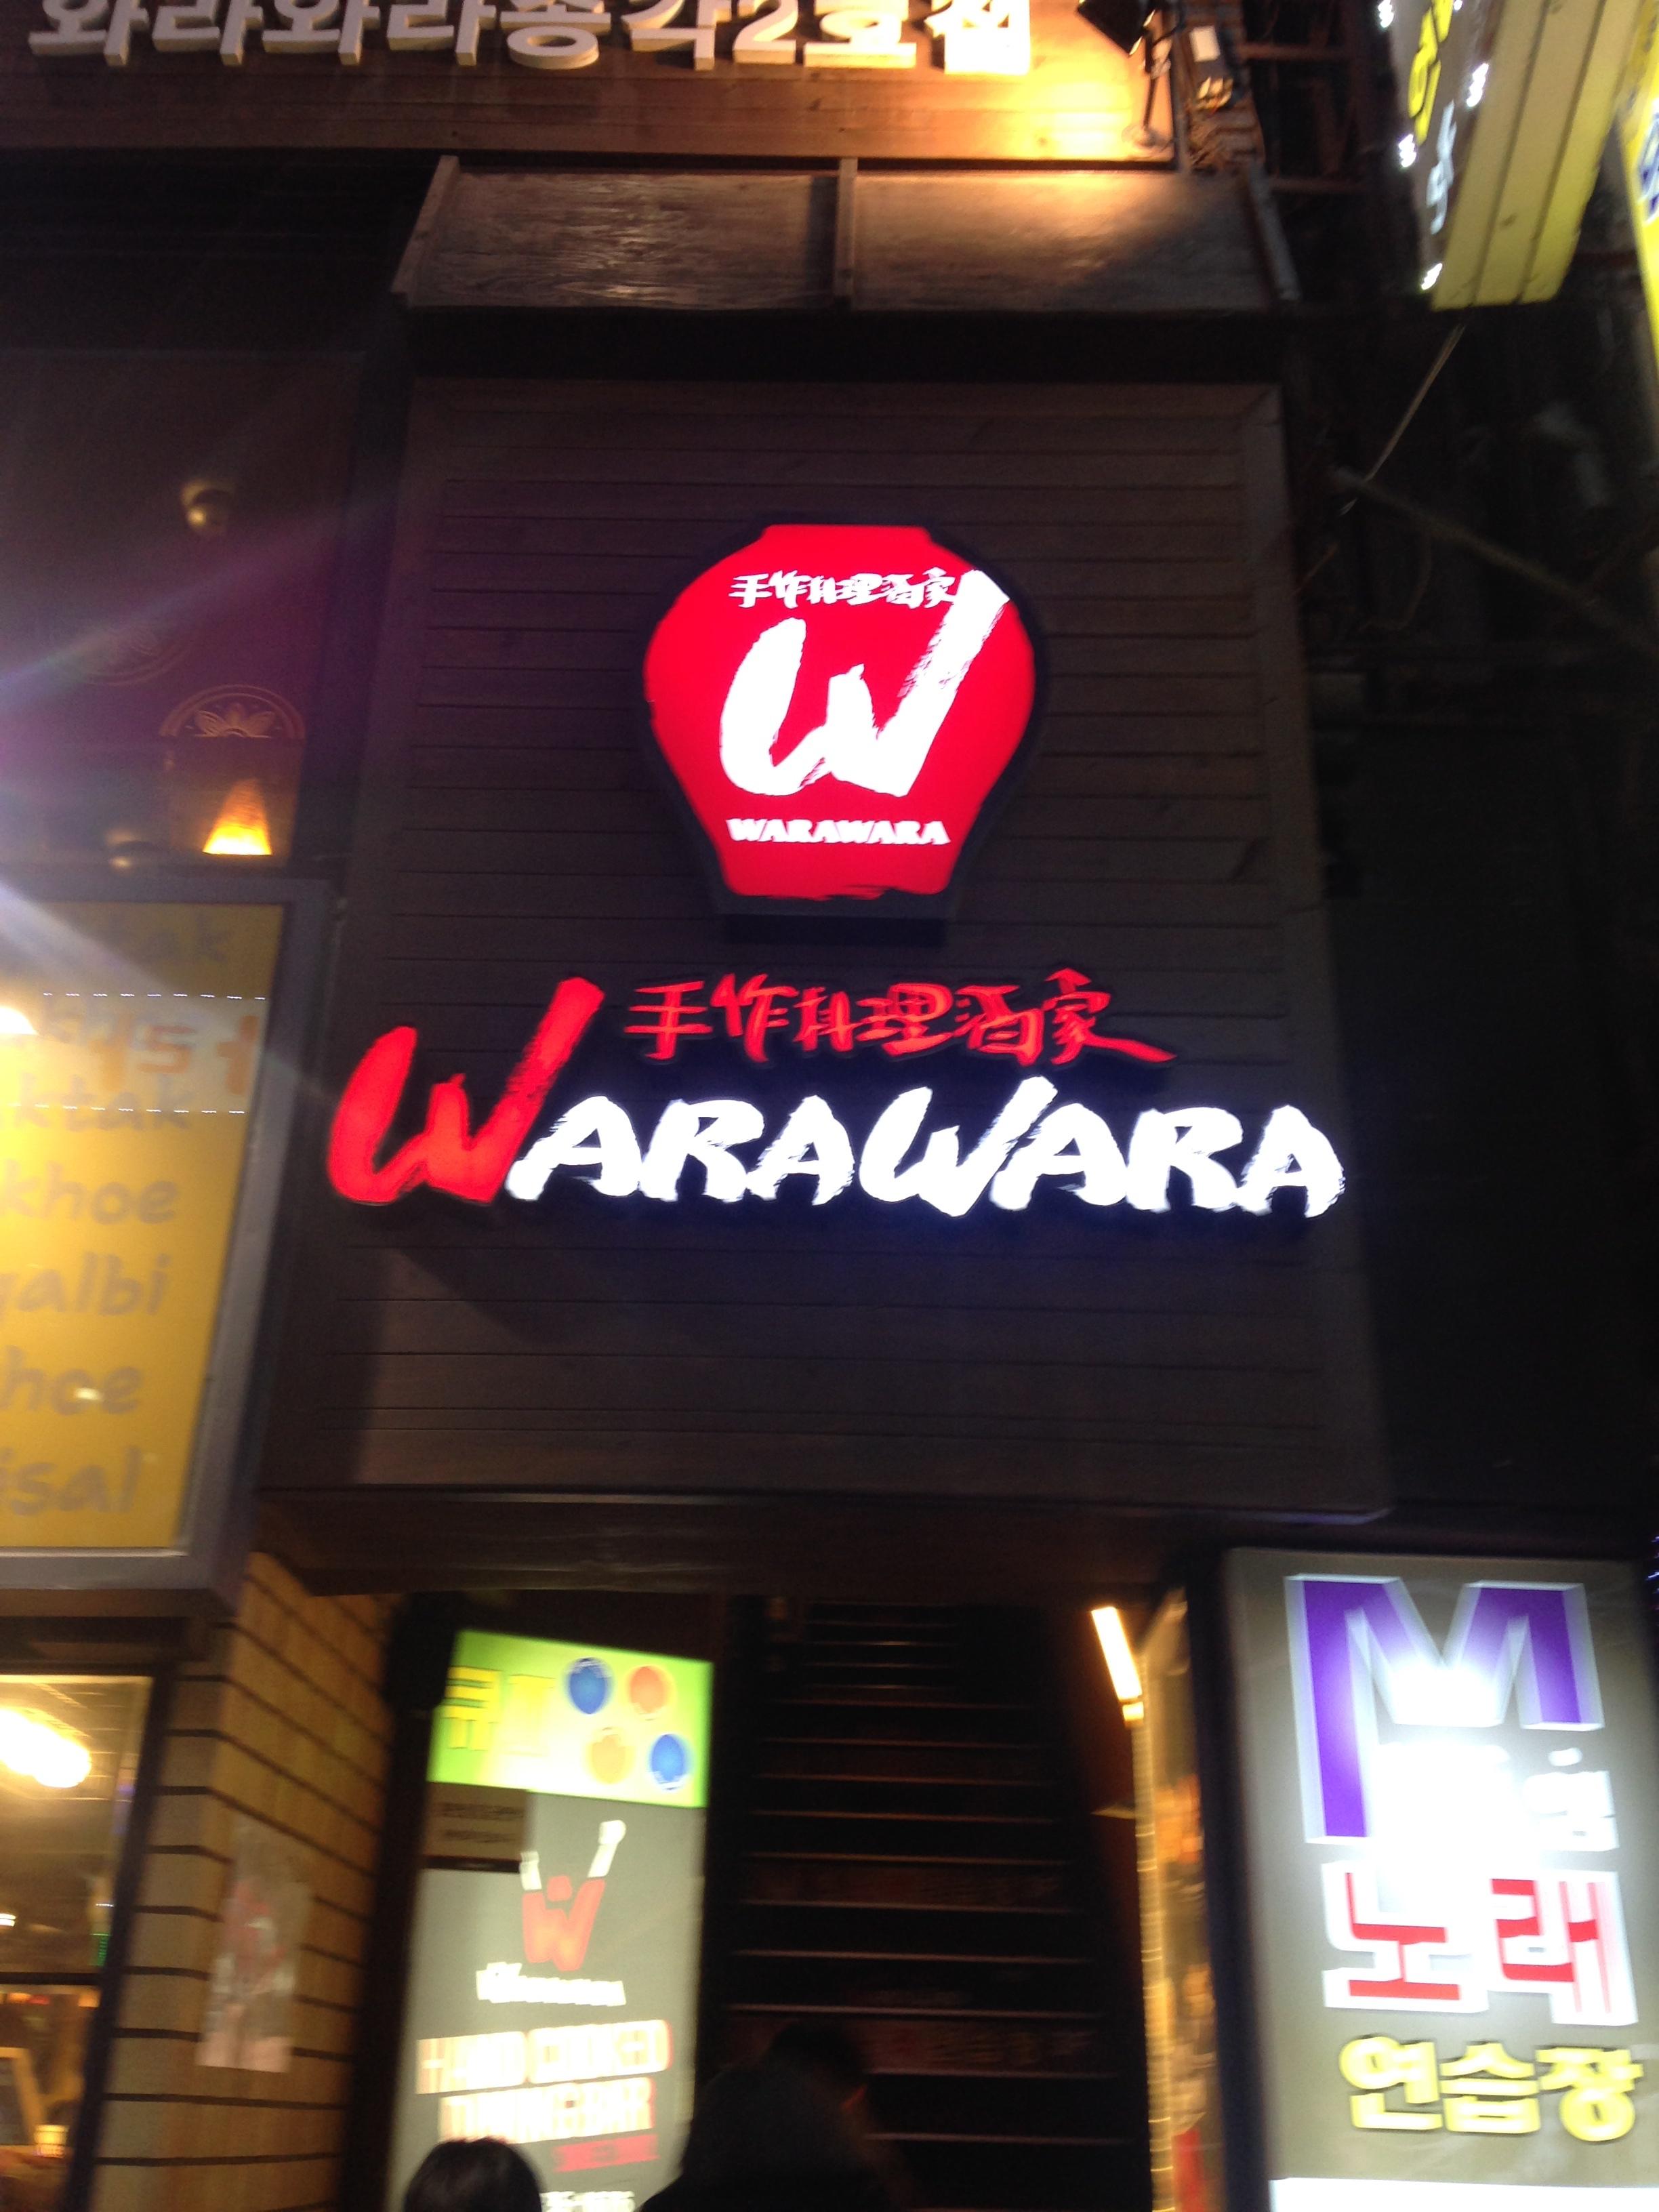 restaurace WaraWara v Gangnam street, velice oblíbená